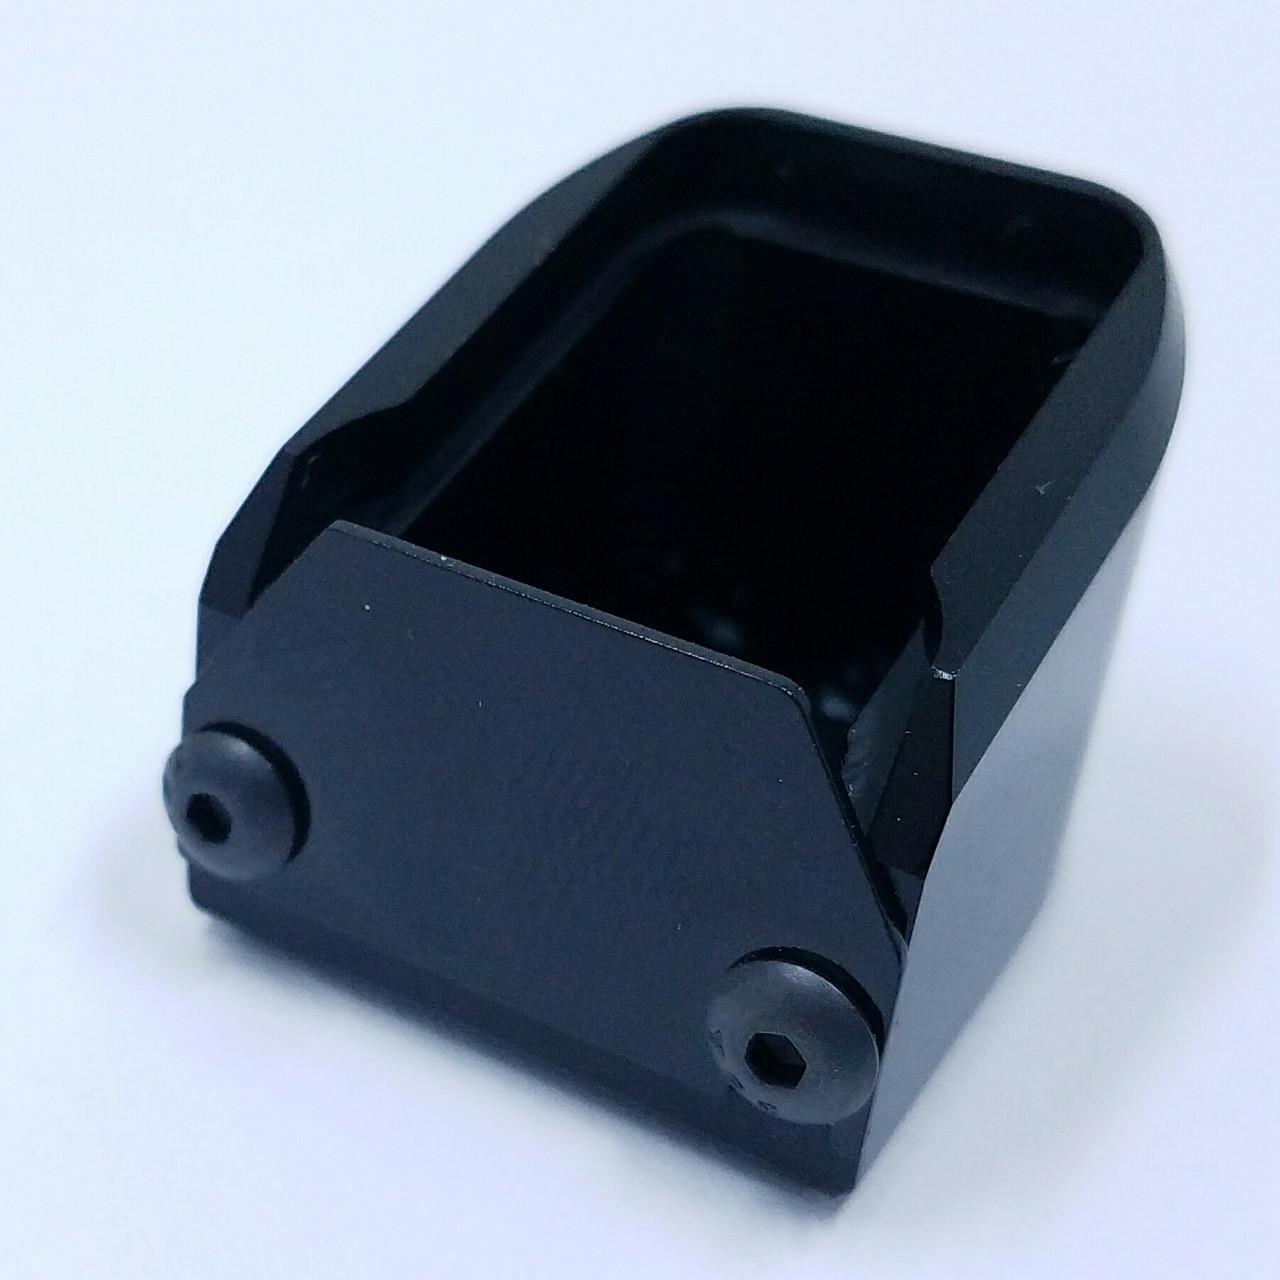 XDM New Style +3 Basepad - Black